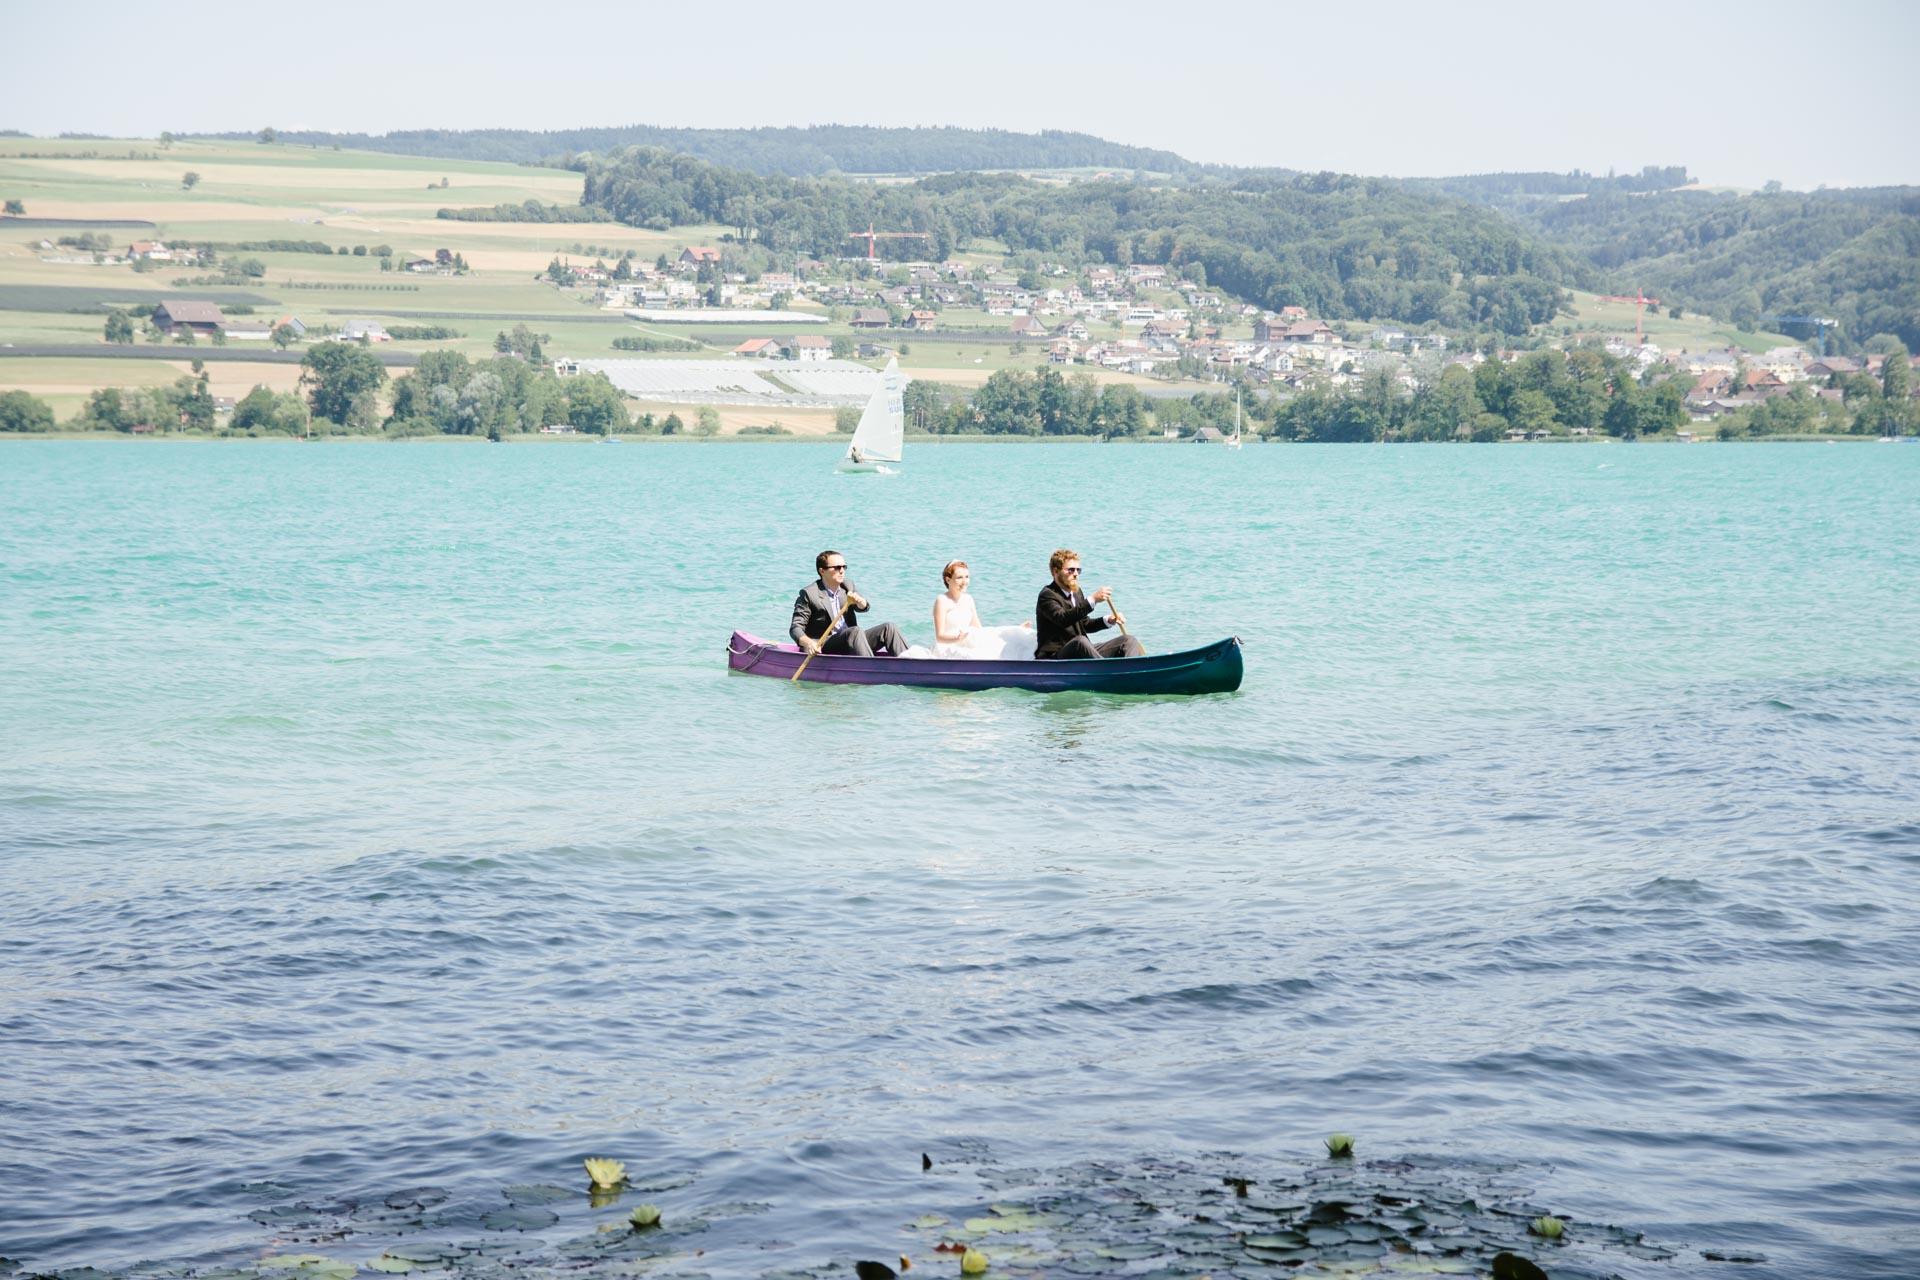 Pixelart_Hochzeitsfotografen_Loerrach_Rheinfelden_Hallwil_Schweiz_Linda-Ramon-1019